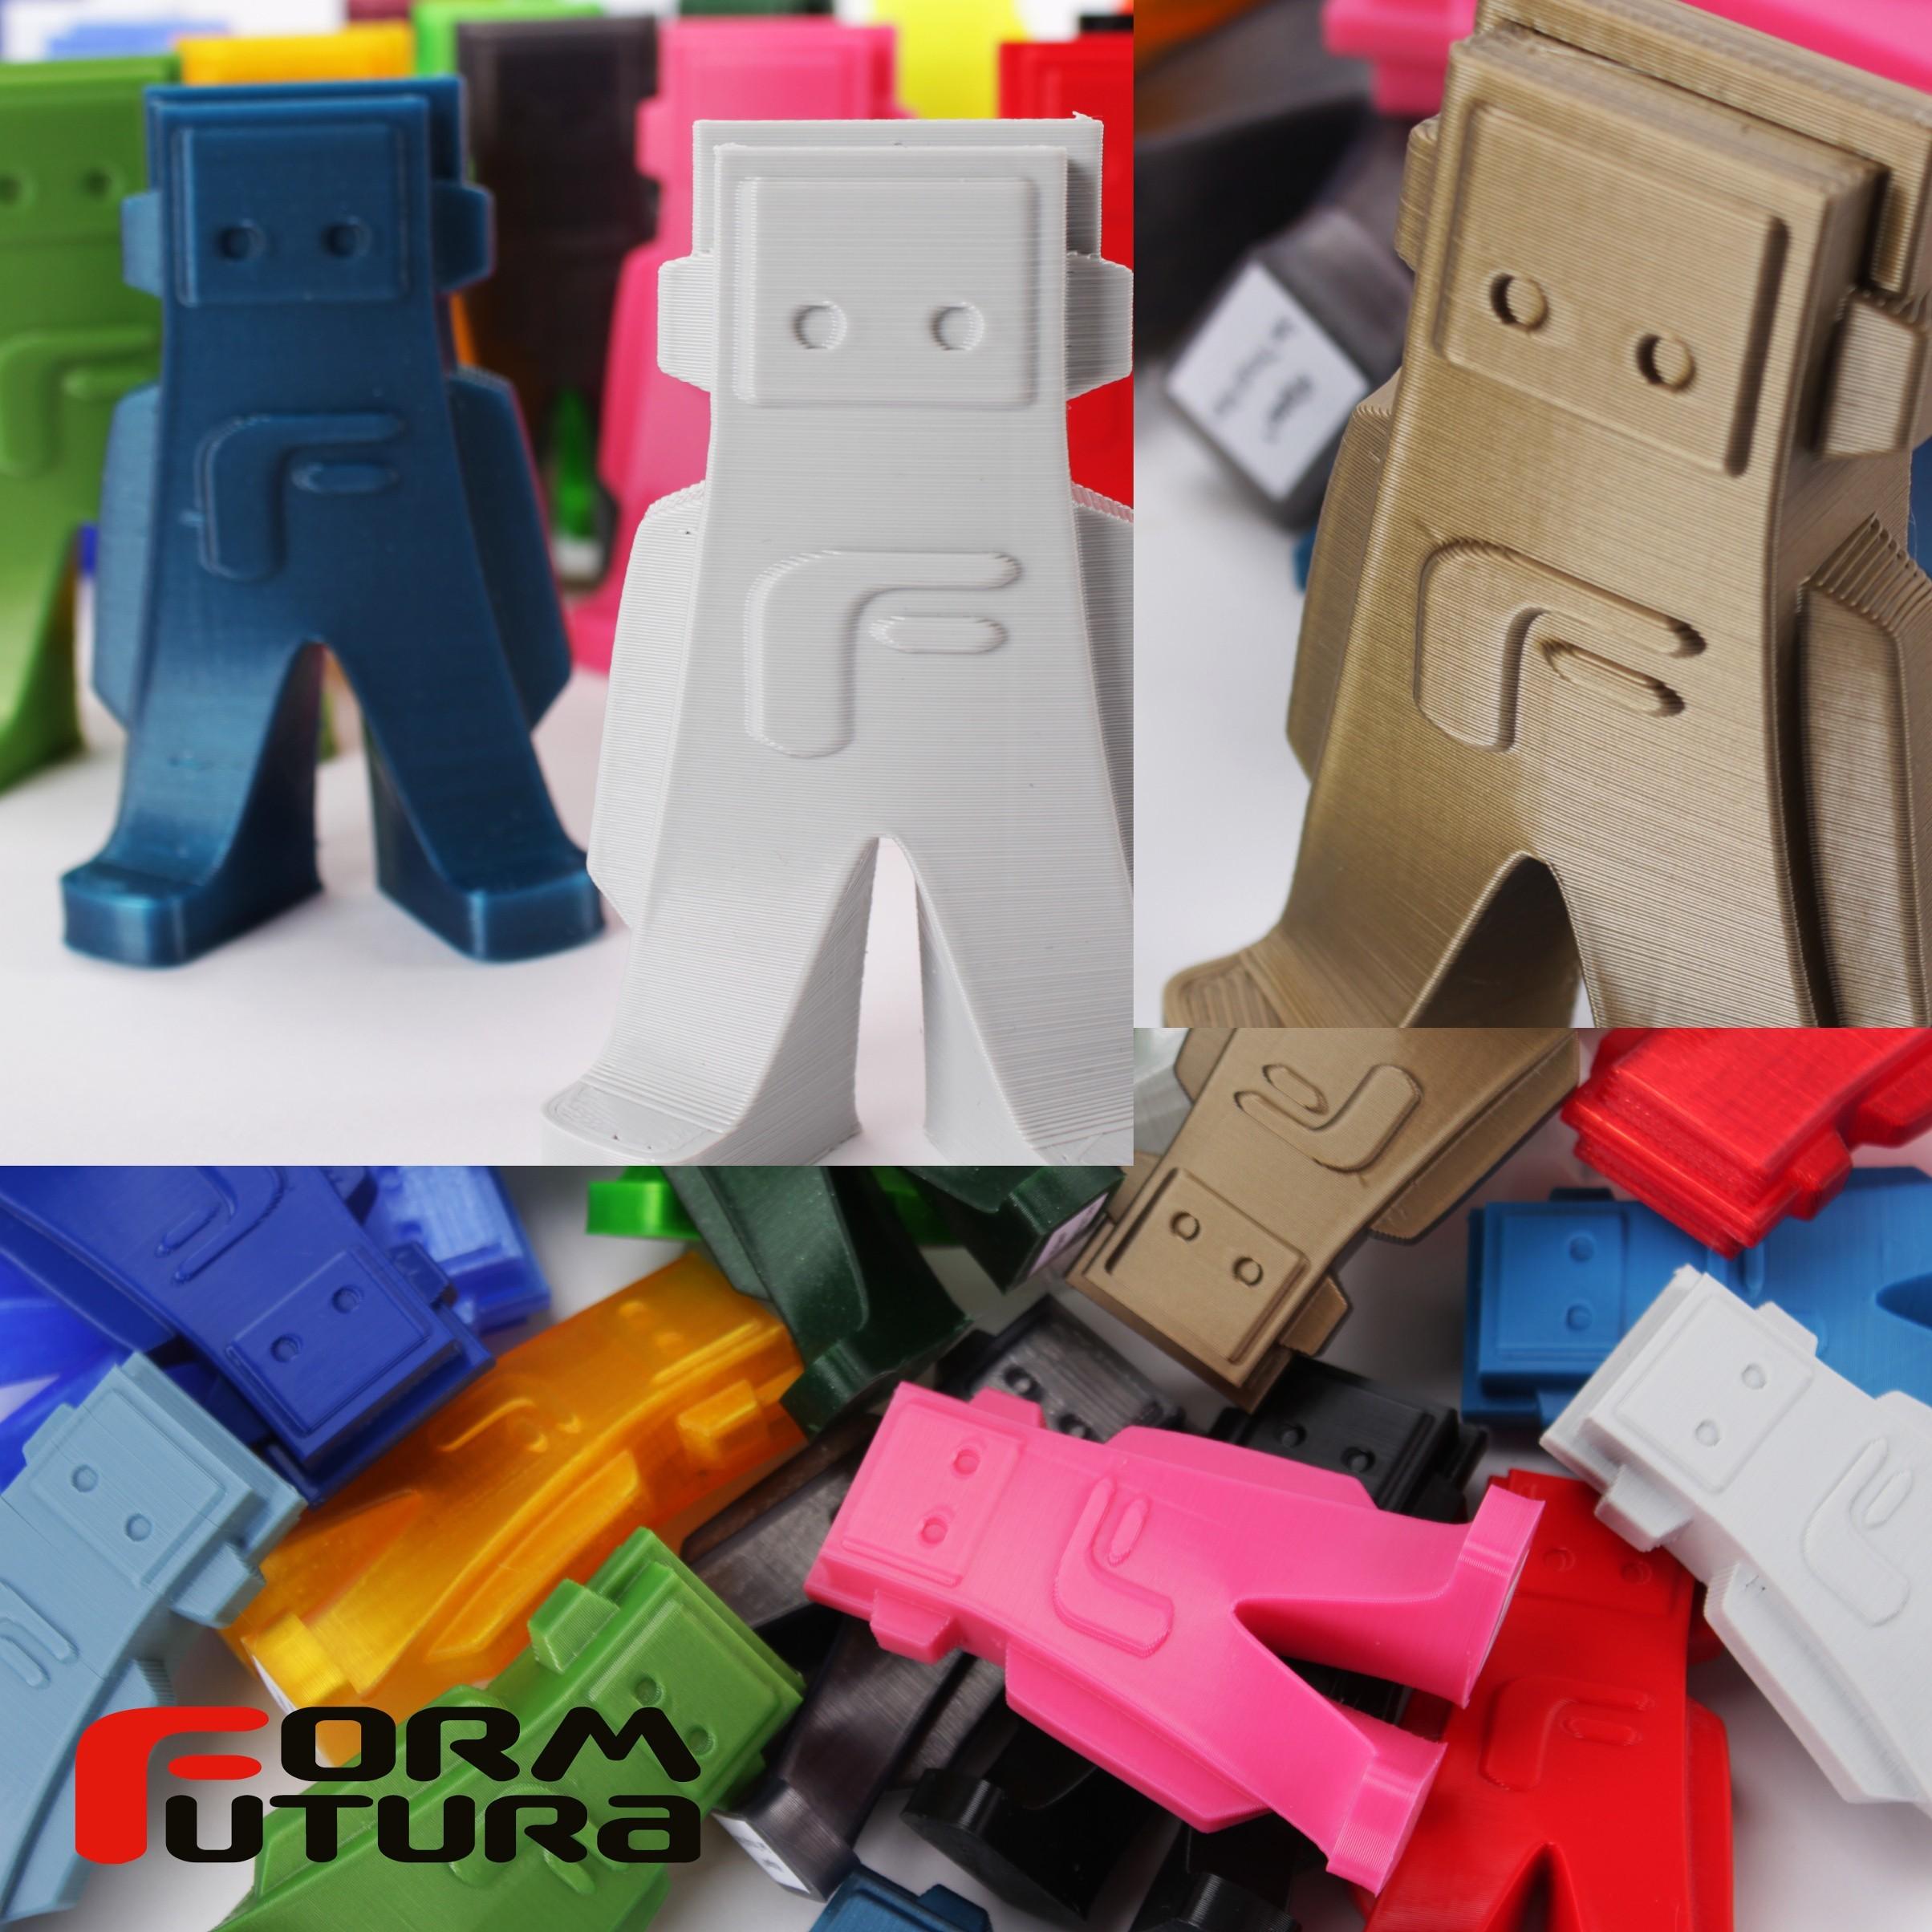 hi.jpg Download free STL file Fil Futura • 3D printer design, Formfutura